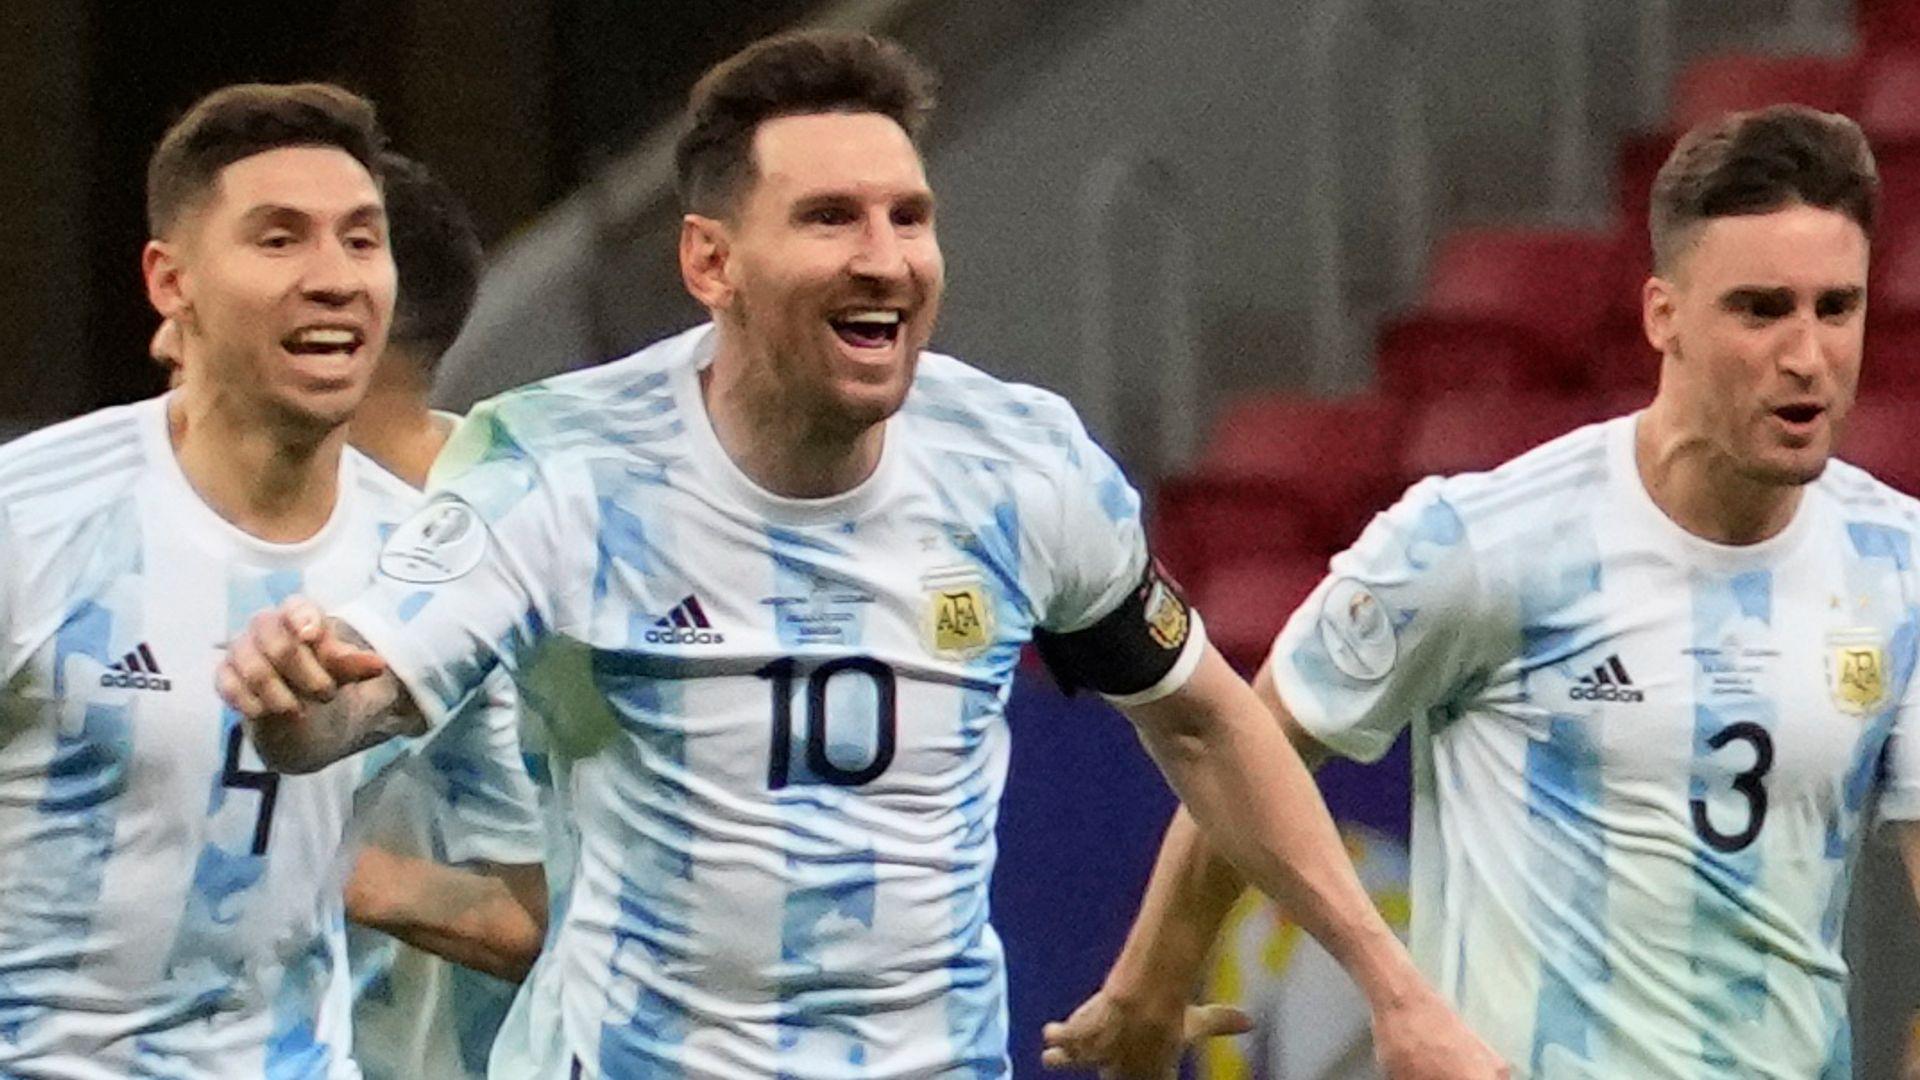 Copa America: Argentina to face Brazil in final